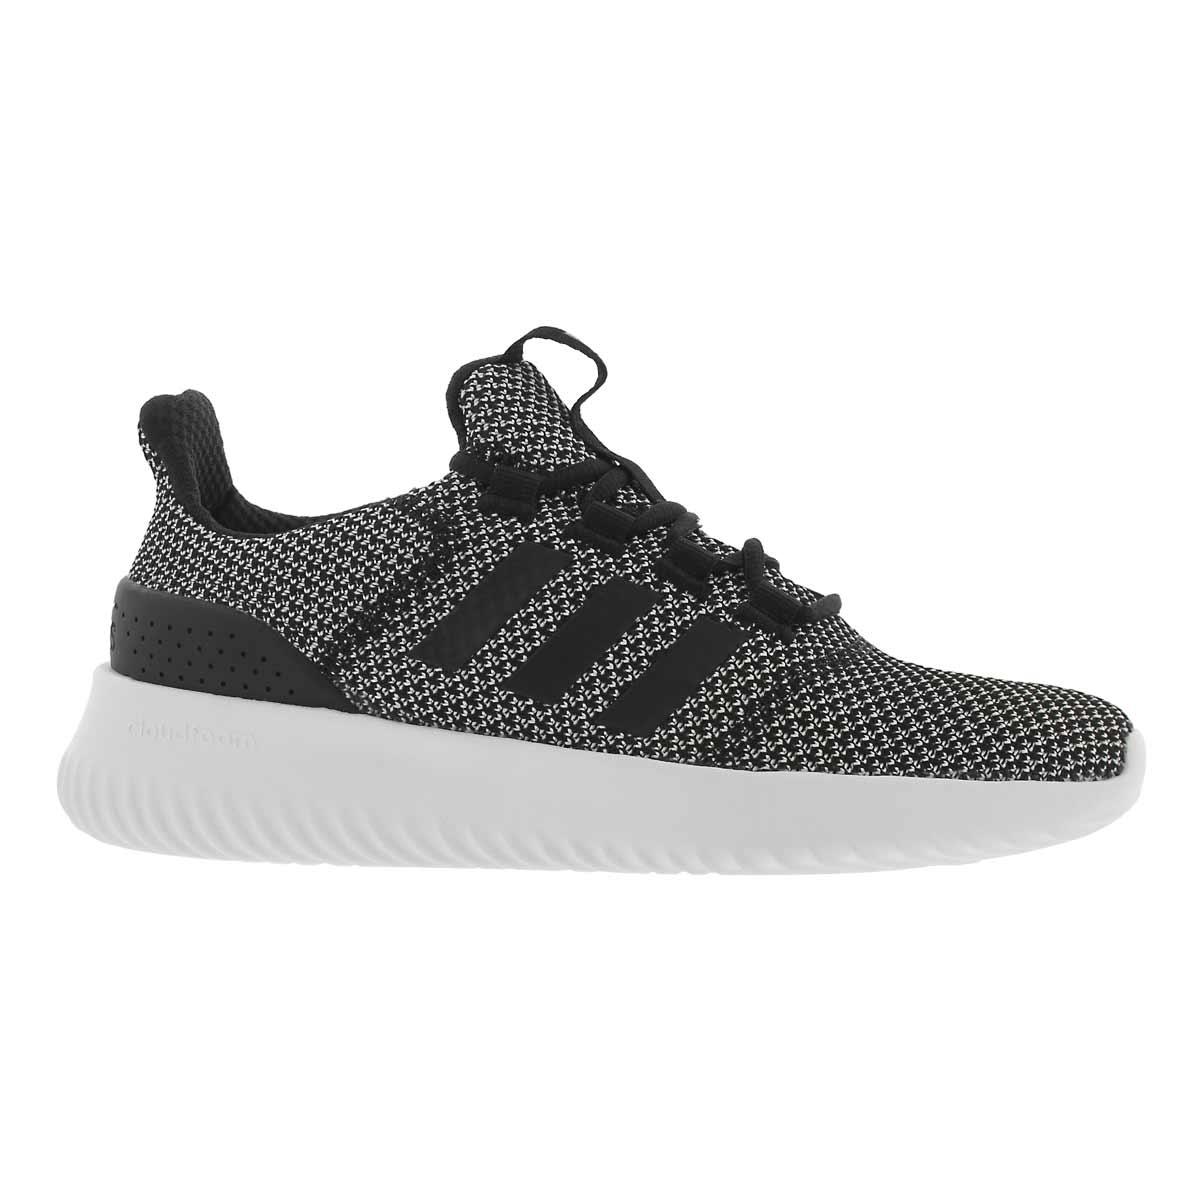 Lds Cloudfoam Ultimate blk running shoe